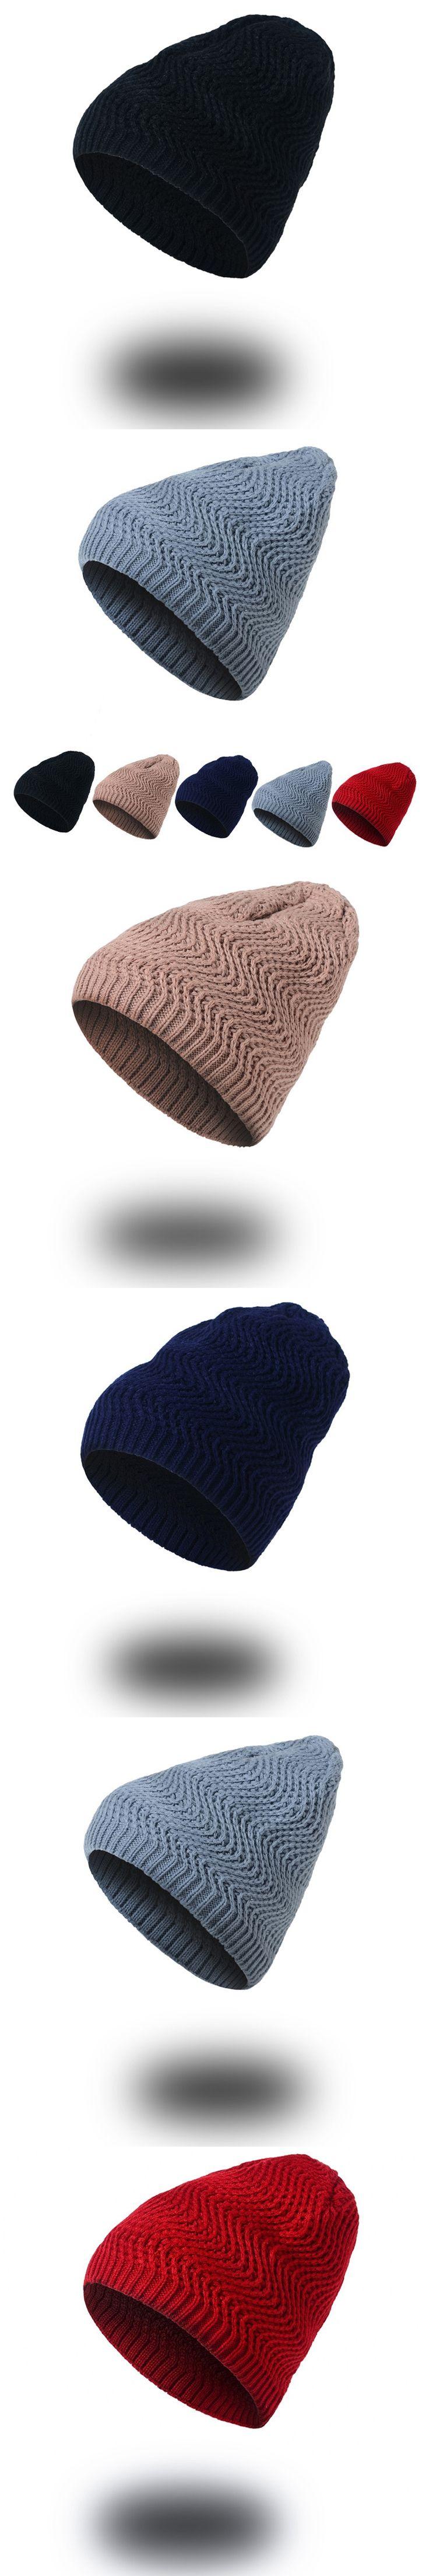 1pcsWoman's Warm Winter Cap Women Hats Knitted Beanie Hat for Men Gorros Casquette Homme Bonnet Femme Beanie Skullies Baggy Caps